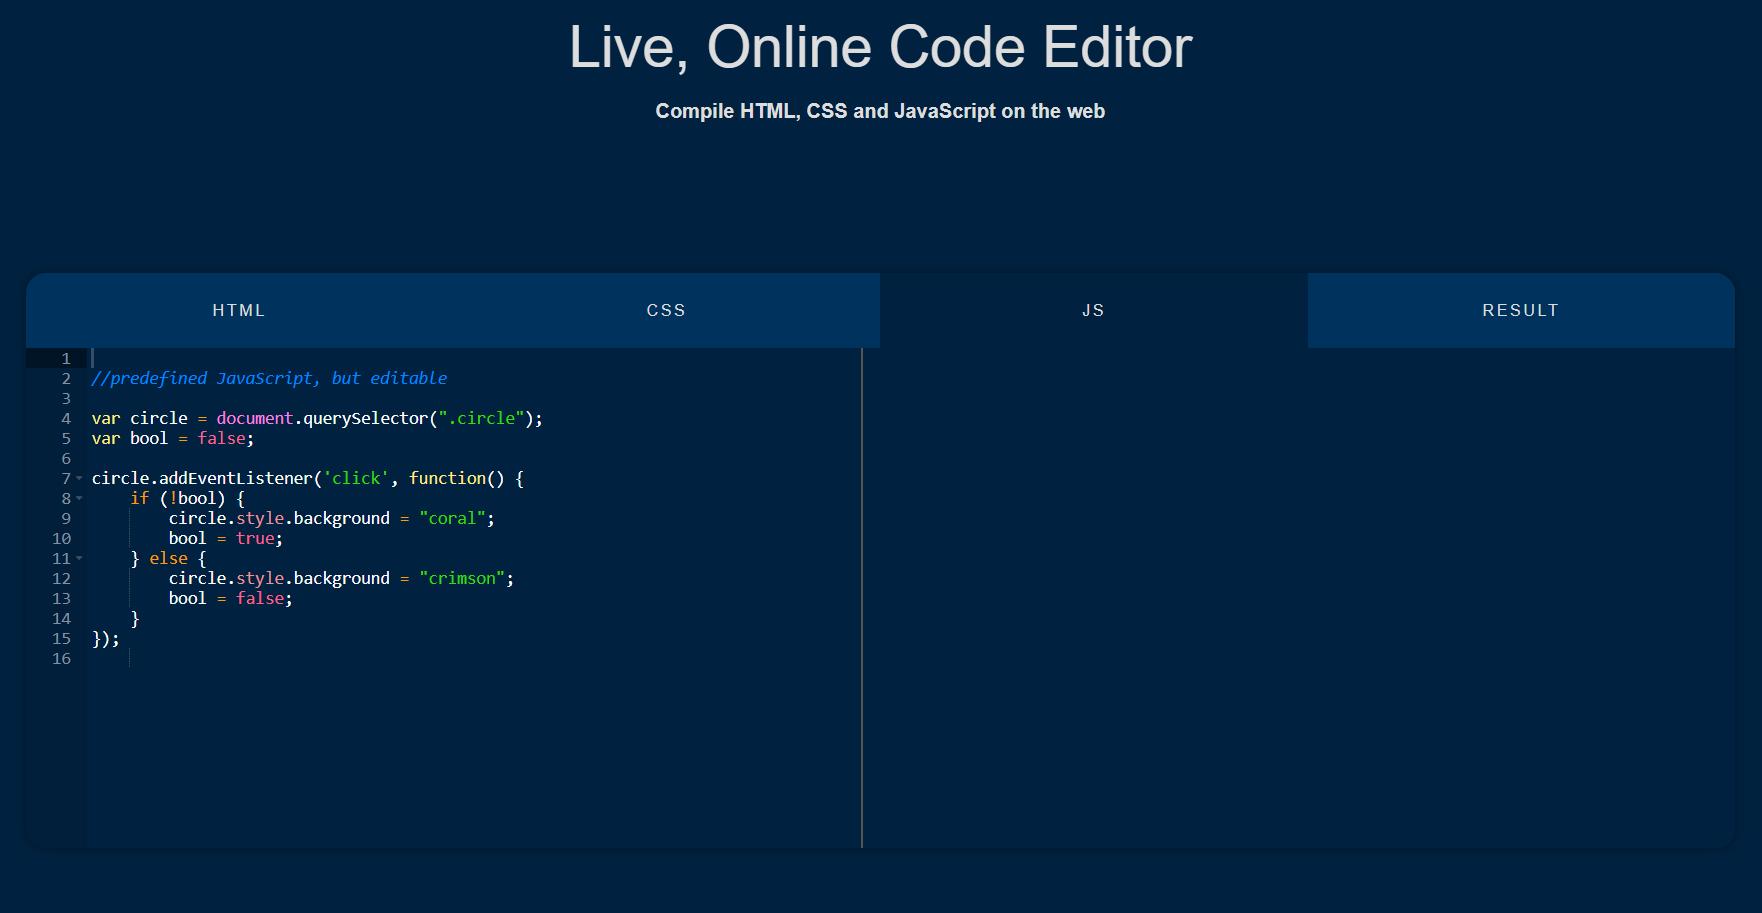 live code editor